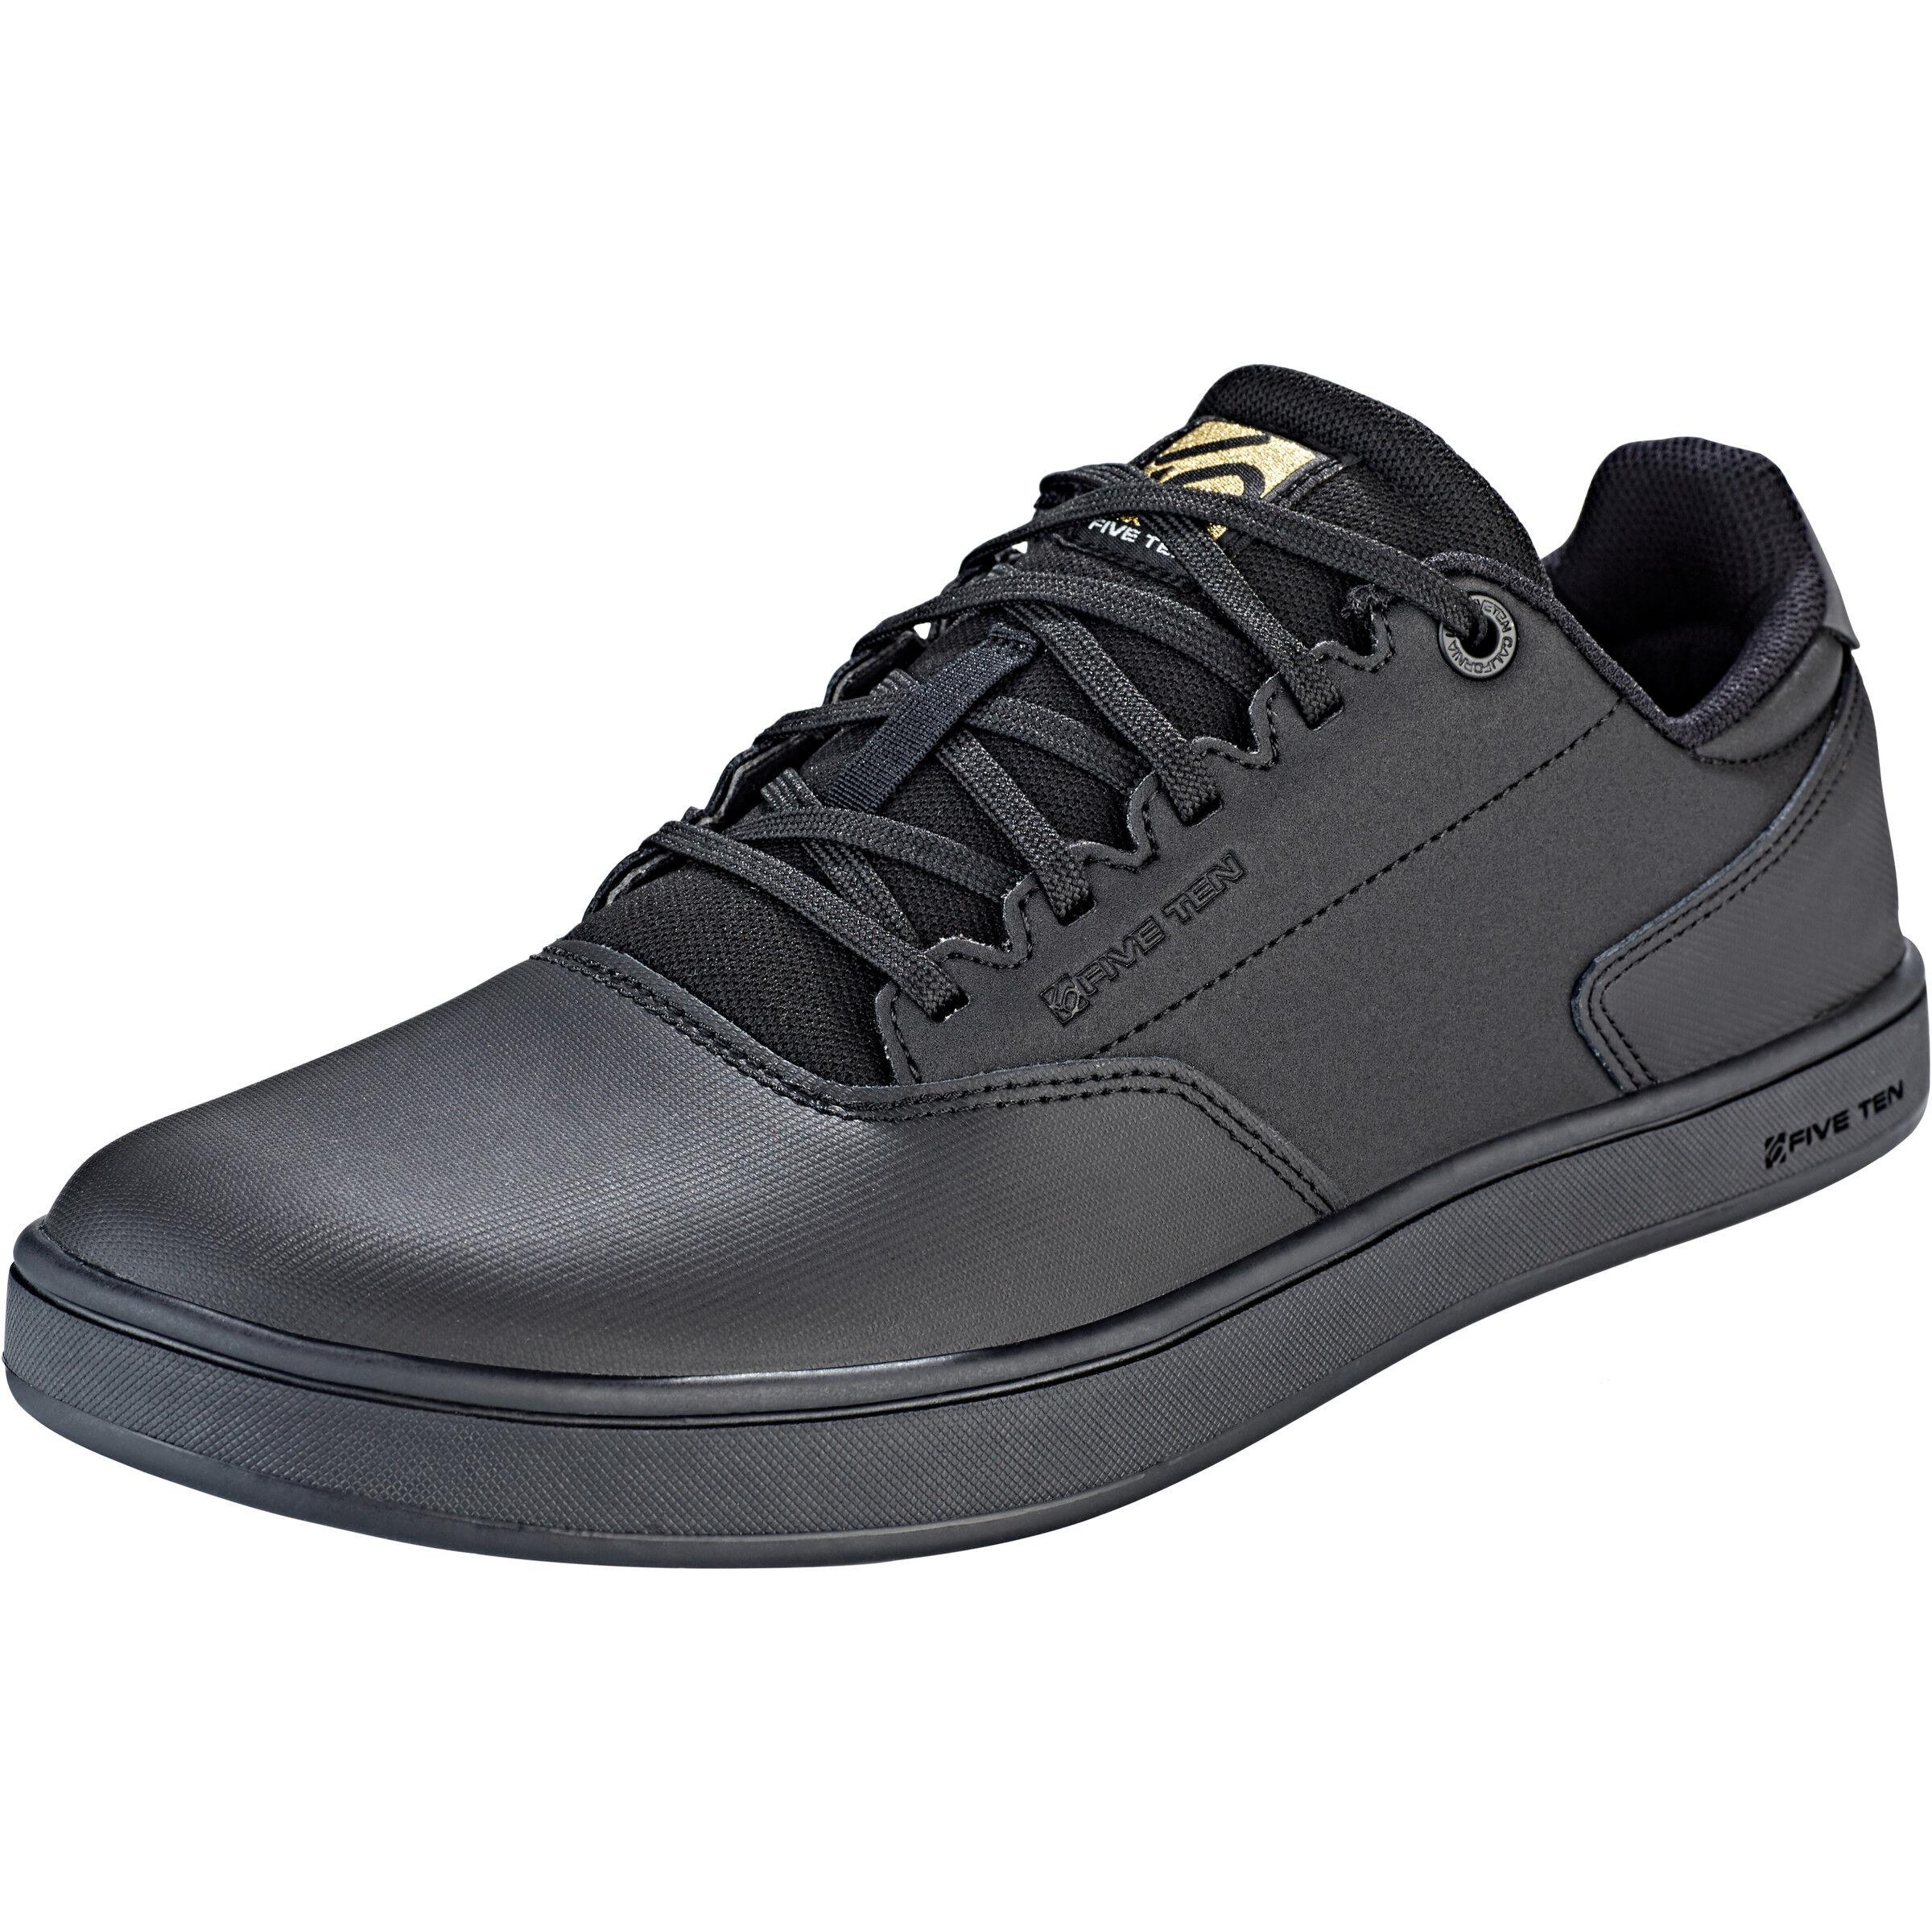 adidas Five Ten 5.10 District Flats Shoes Herren core blackcore blackgoldmt